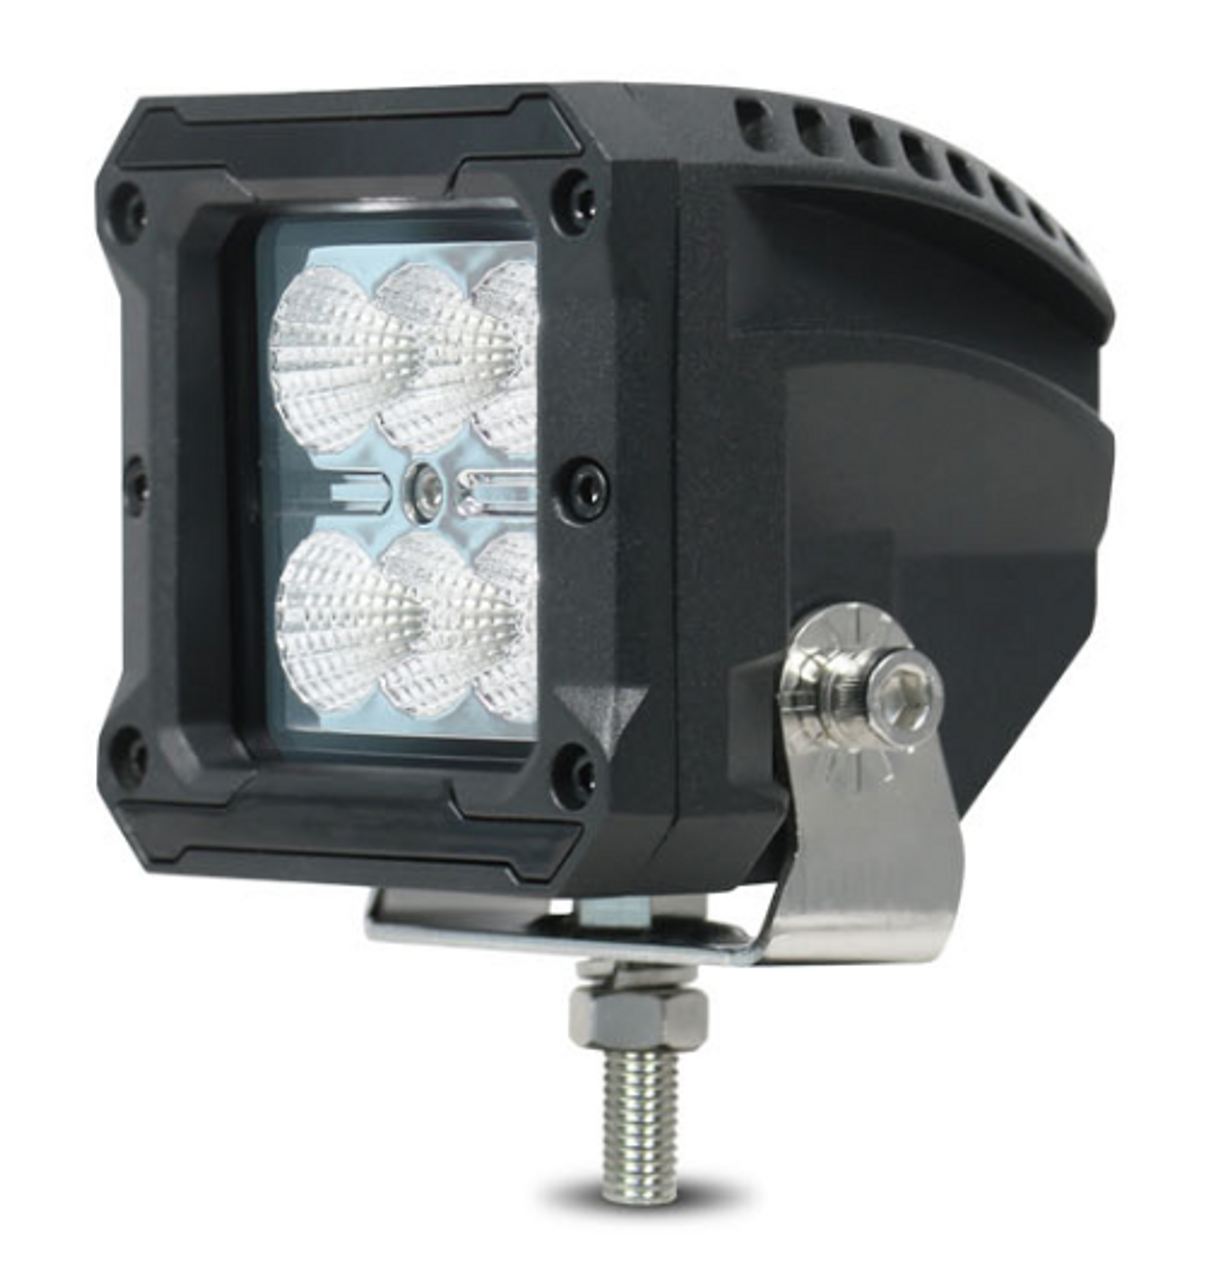 RWL3618S - 3 Inch Square LED Spot Beam Work Light. 12 Watt. Multi-Volt 10 to 30 Volt DC. 5 Year Warranty. Spot Beam 12 watts. Roadvision. Ultimate LED.